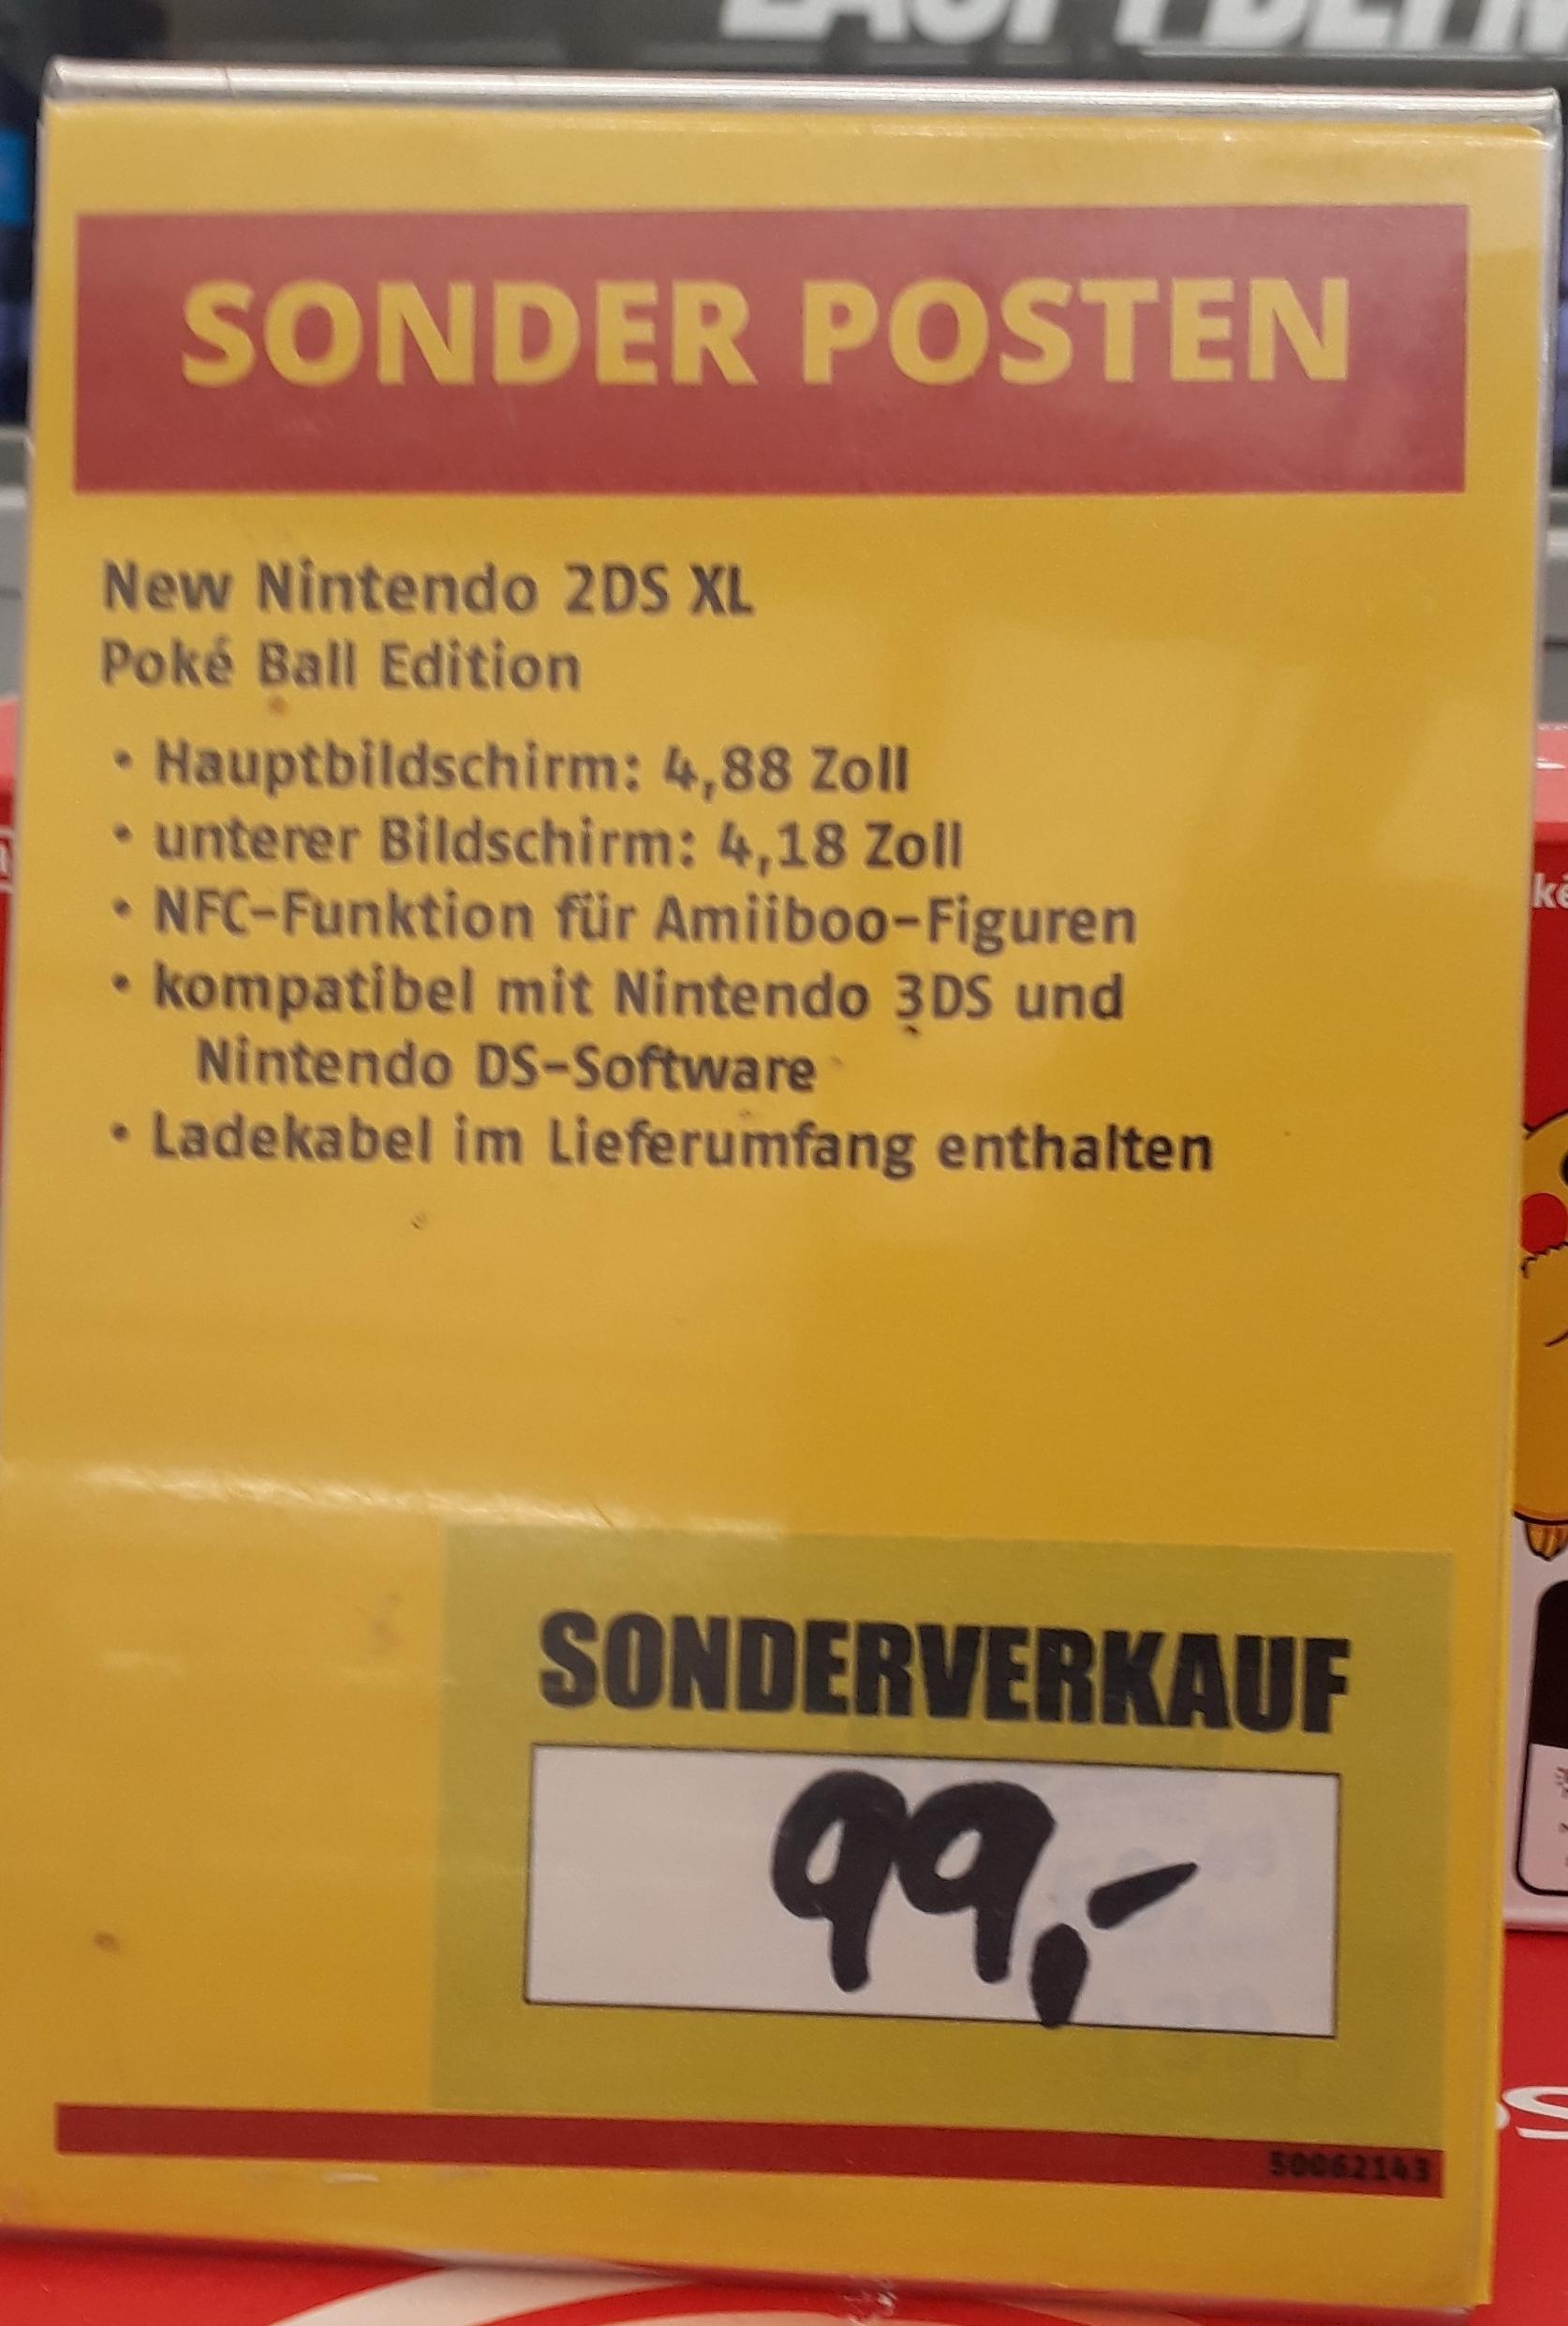 [LOKAL ESSEN] - Nintendo New 2DS XL Poké Ball Edition rot/weiß für 99,00 EUR